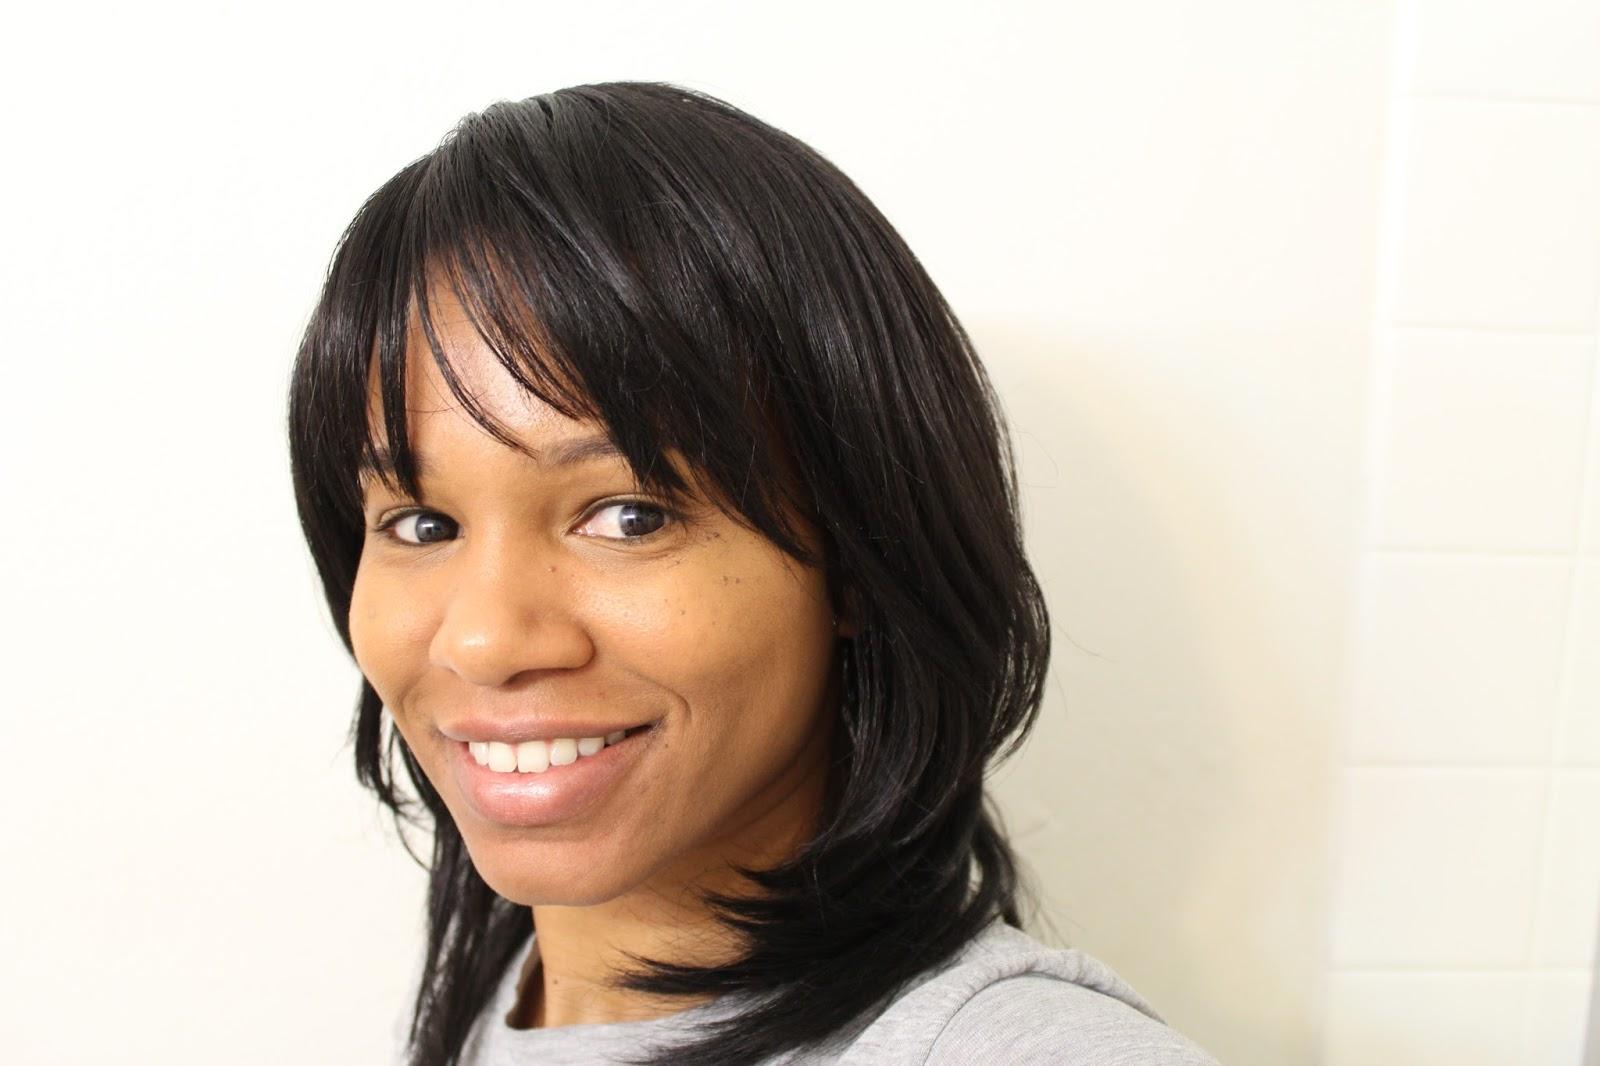 www.curlyincolorado.com keeping hair moisturized protective styling